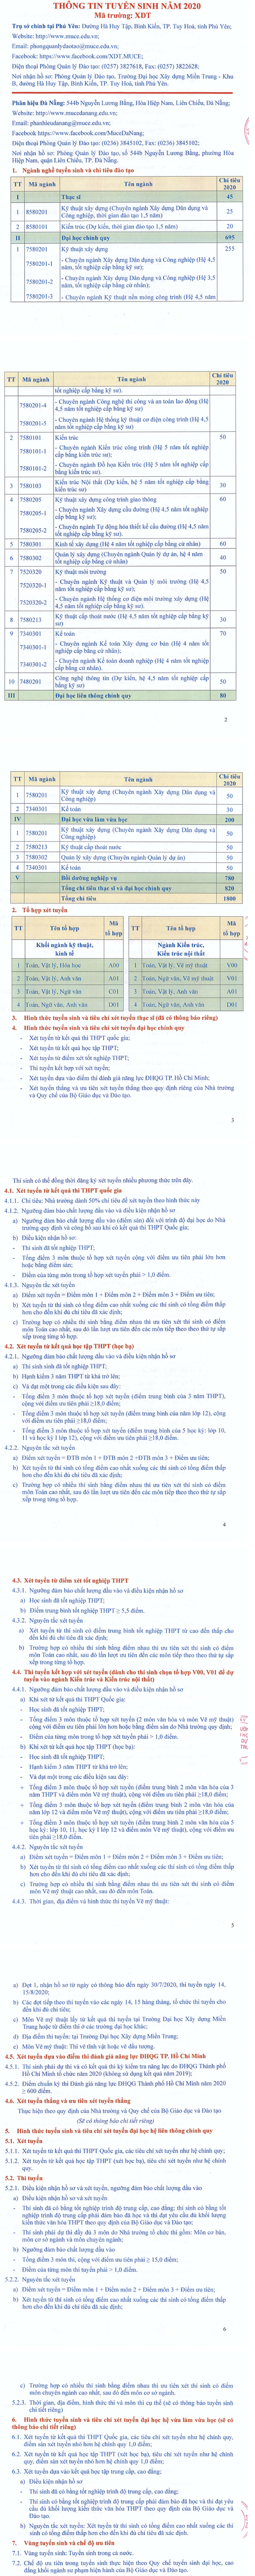 Phuong an tuyen sinh Dai hoc Xay dung mien Trung 2020